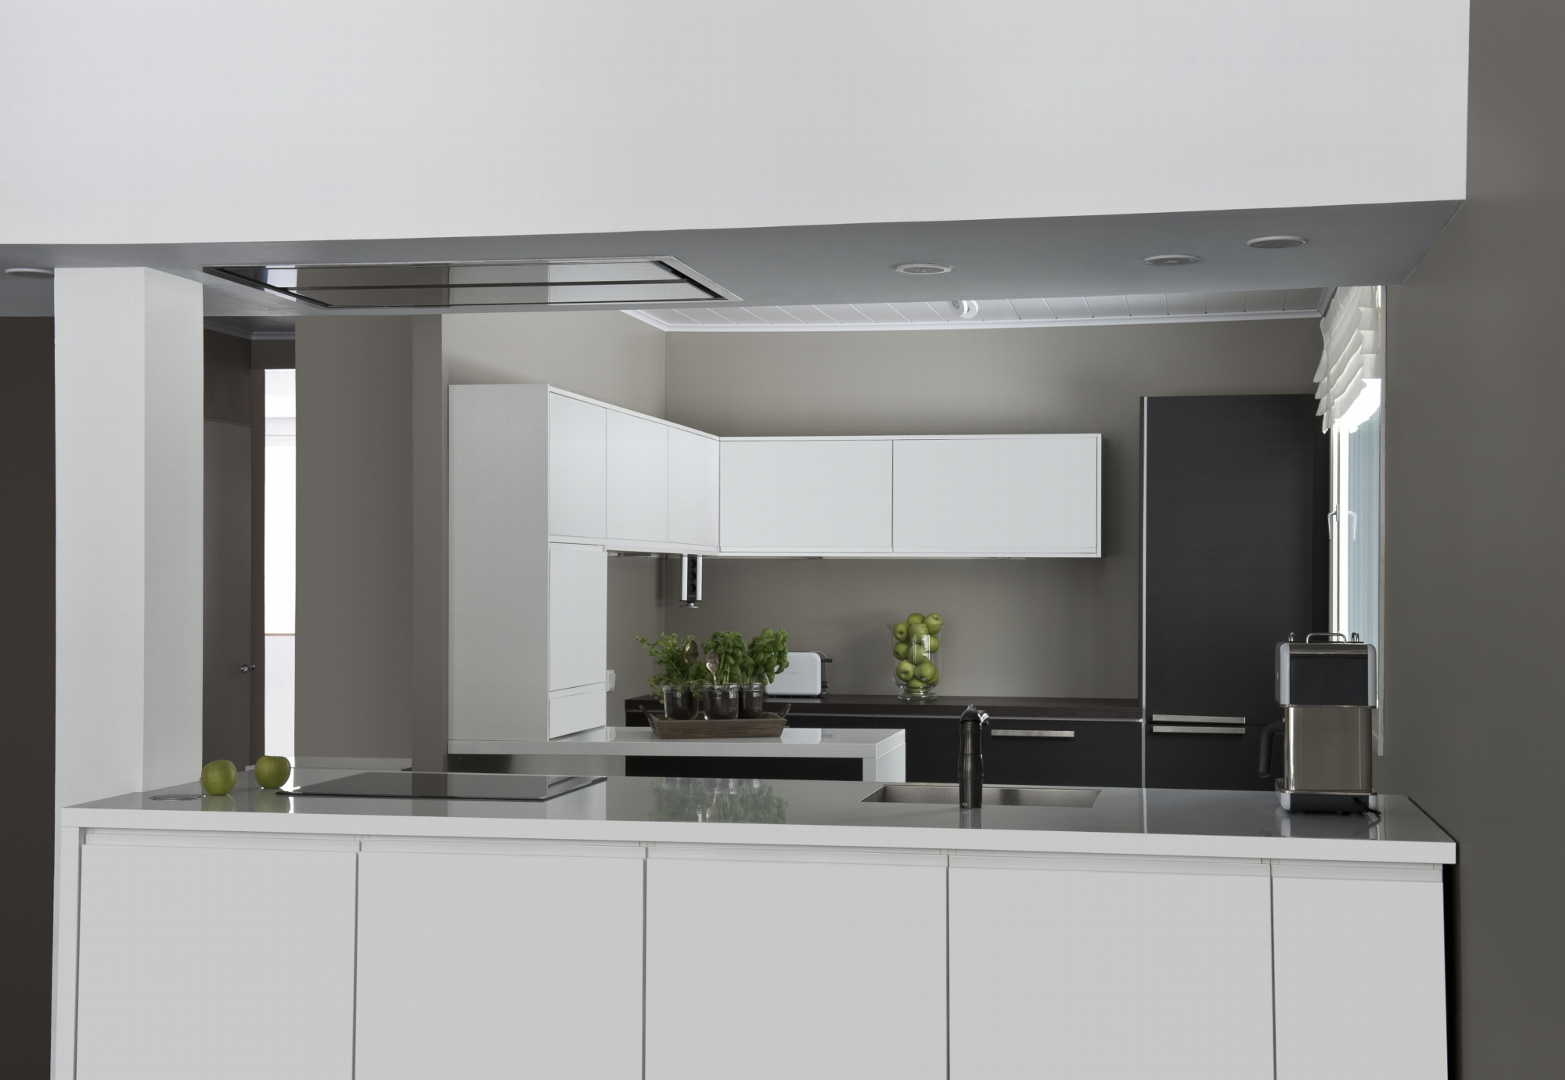 Moderni keittiö, Sisustus  keittiö, Kalustetukku, 52a626b6498e5d0348a63e8f